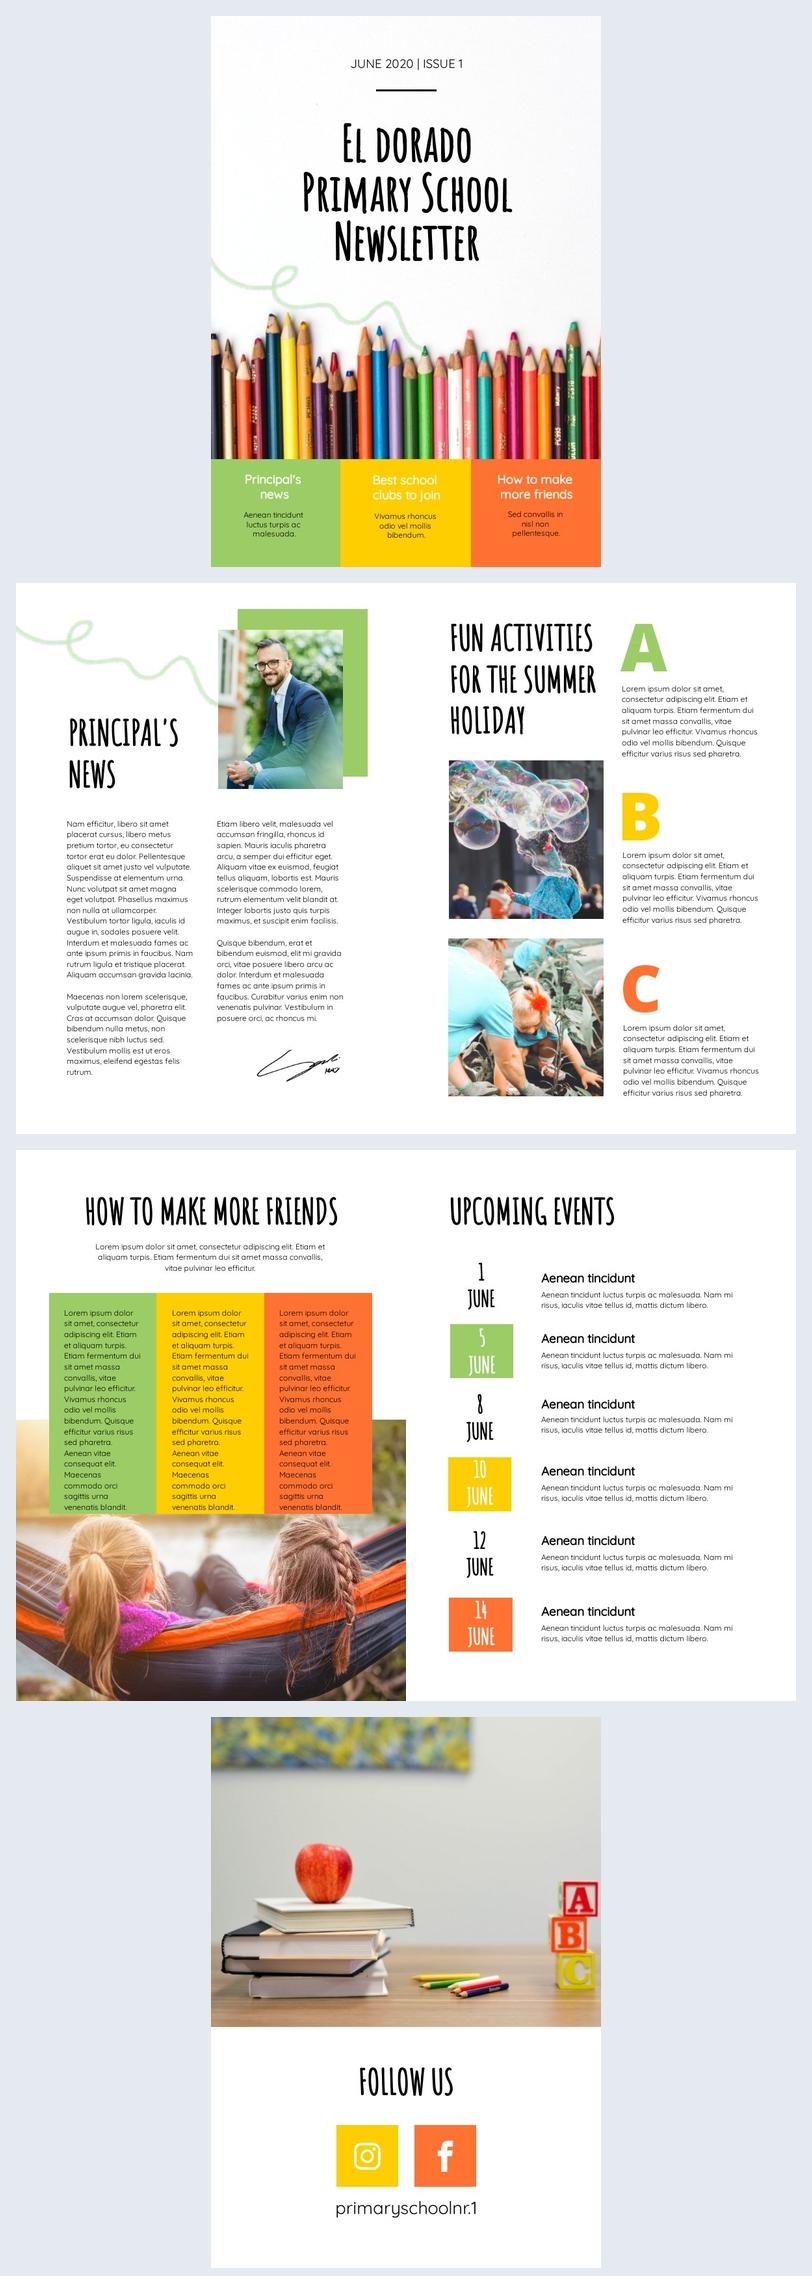 Primary School Newsletter Example Idea